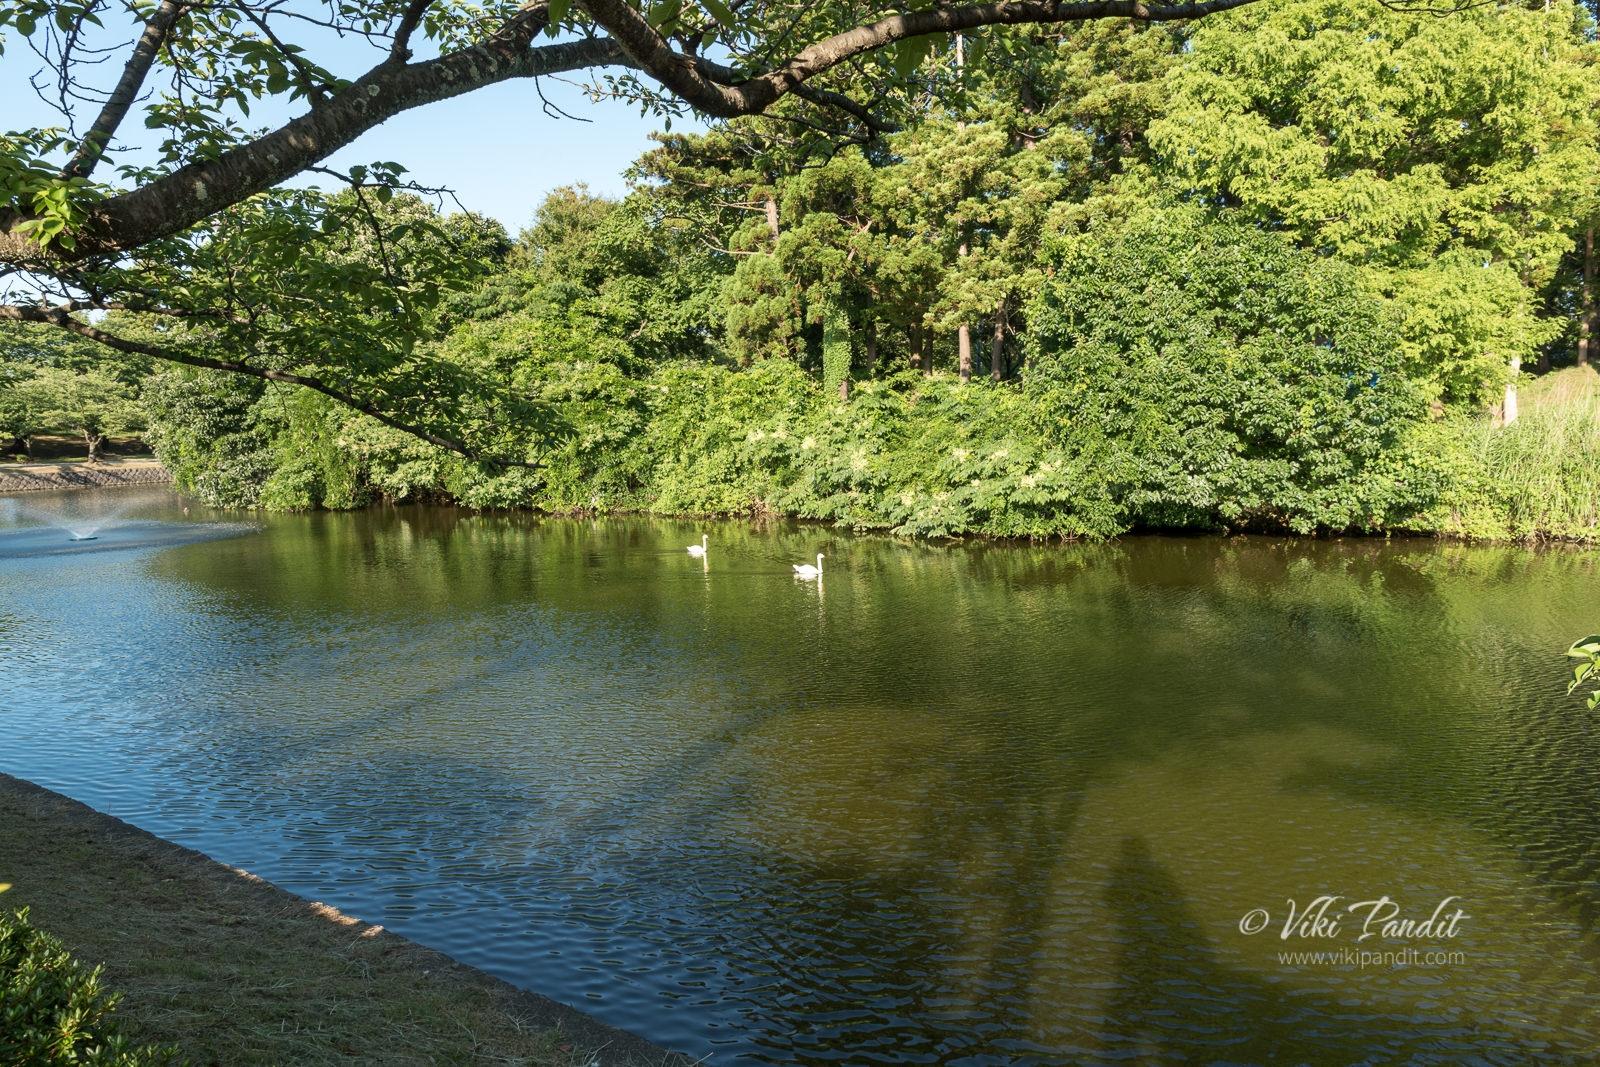 Swans at Tsuruoka Park